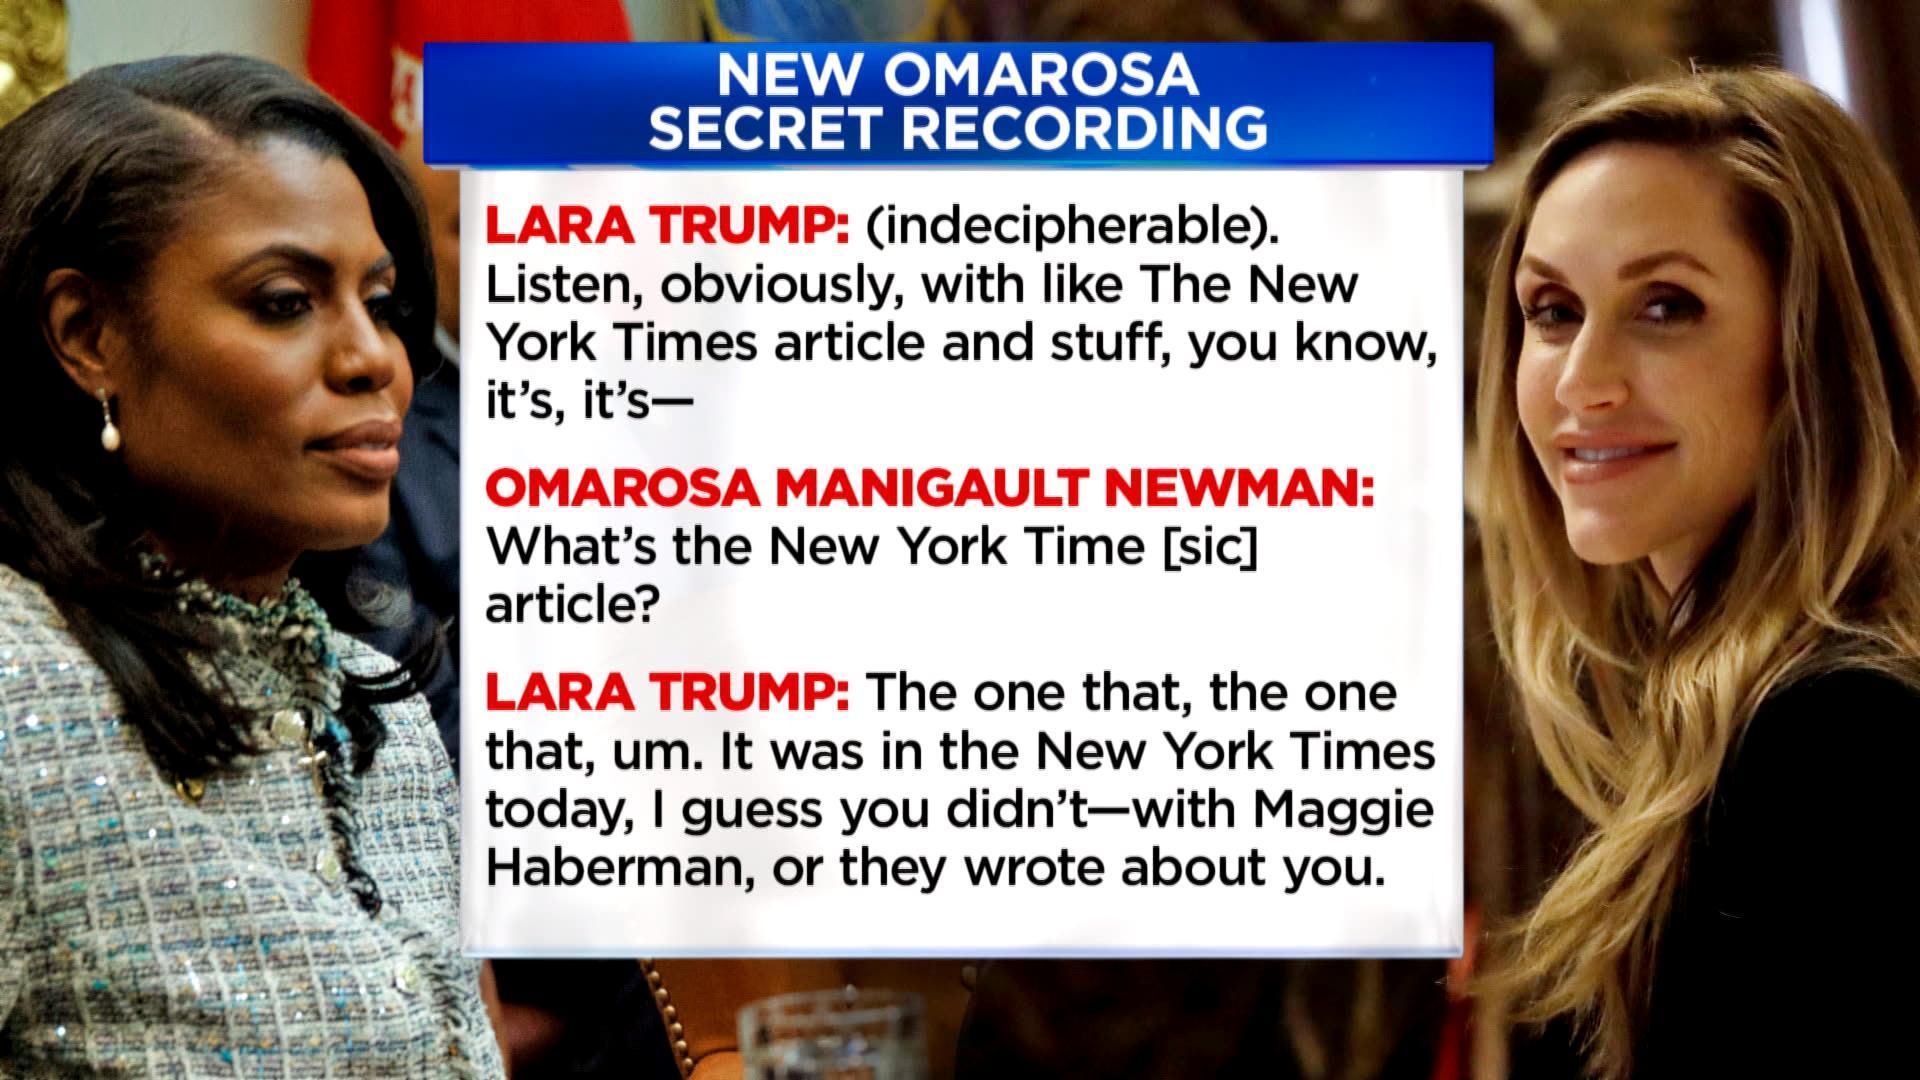 Omarosa releases secret tape of Lara Trump offering her $15K-a-month campaign job